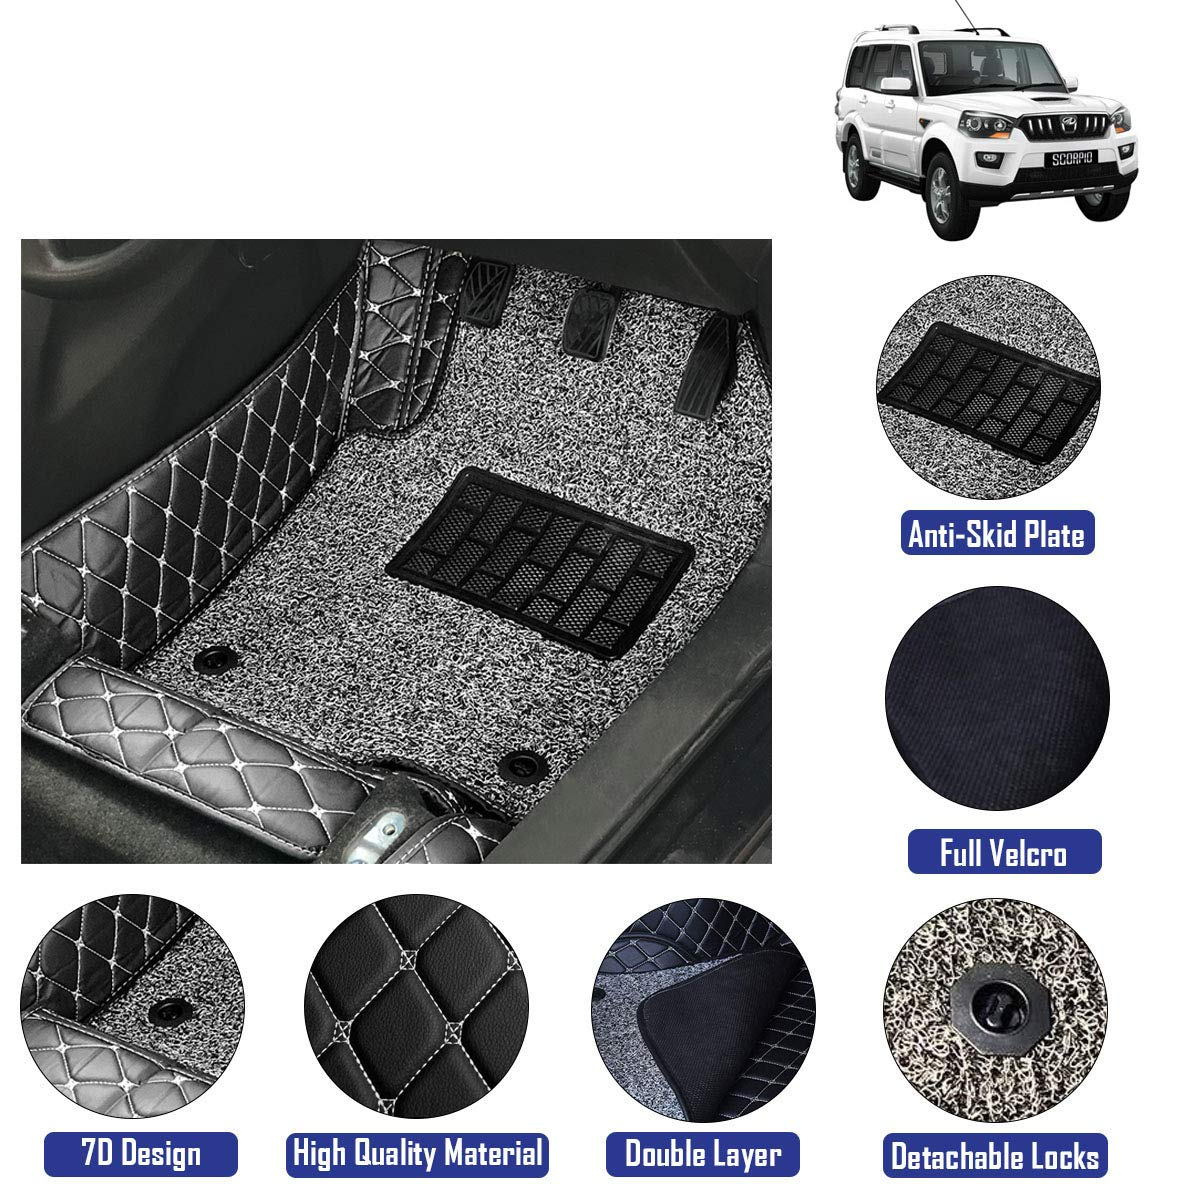 Hyundai i20 2015-2019 Genuine Full Set Of Floor Mats